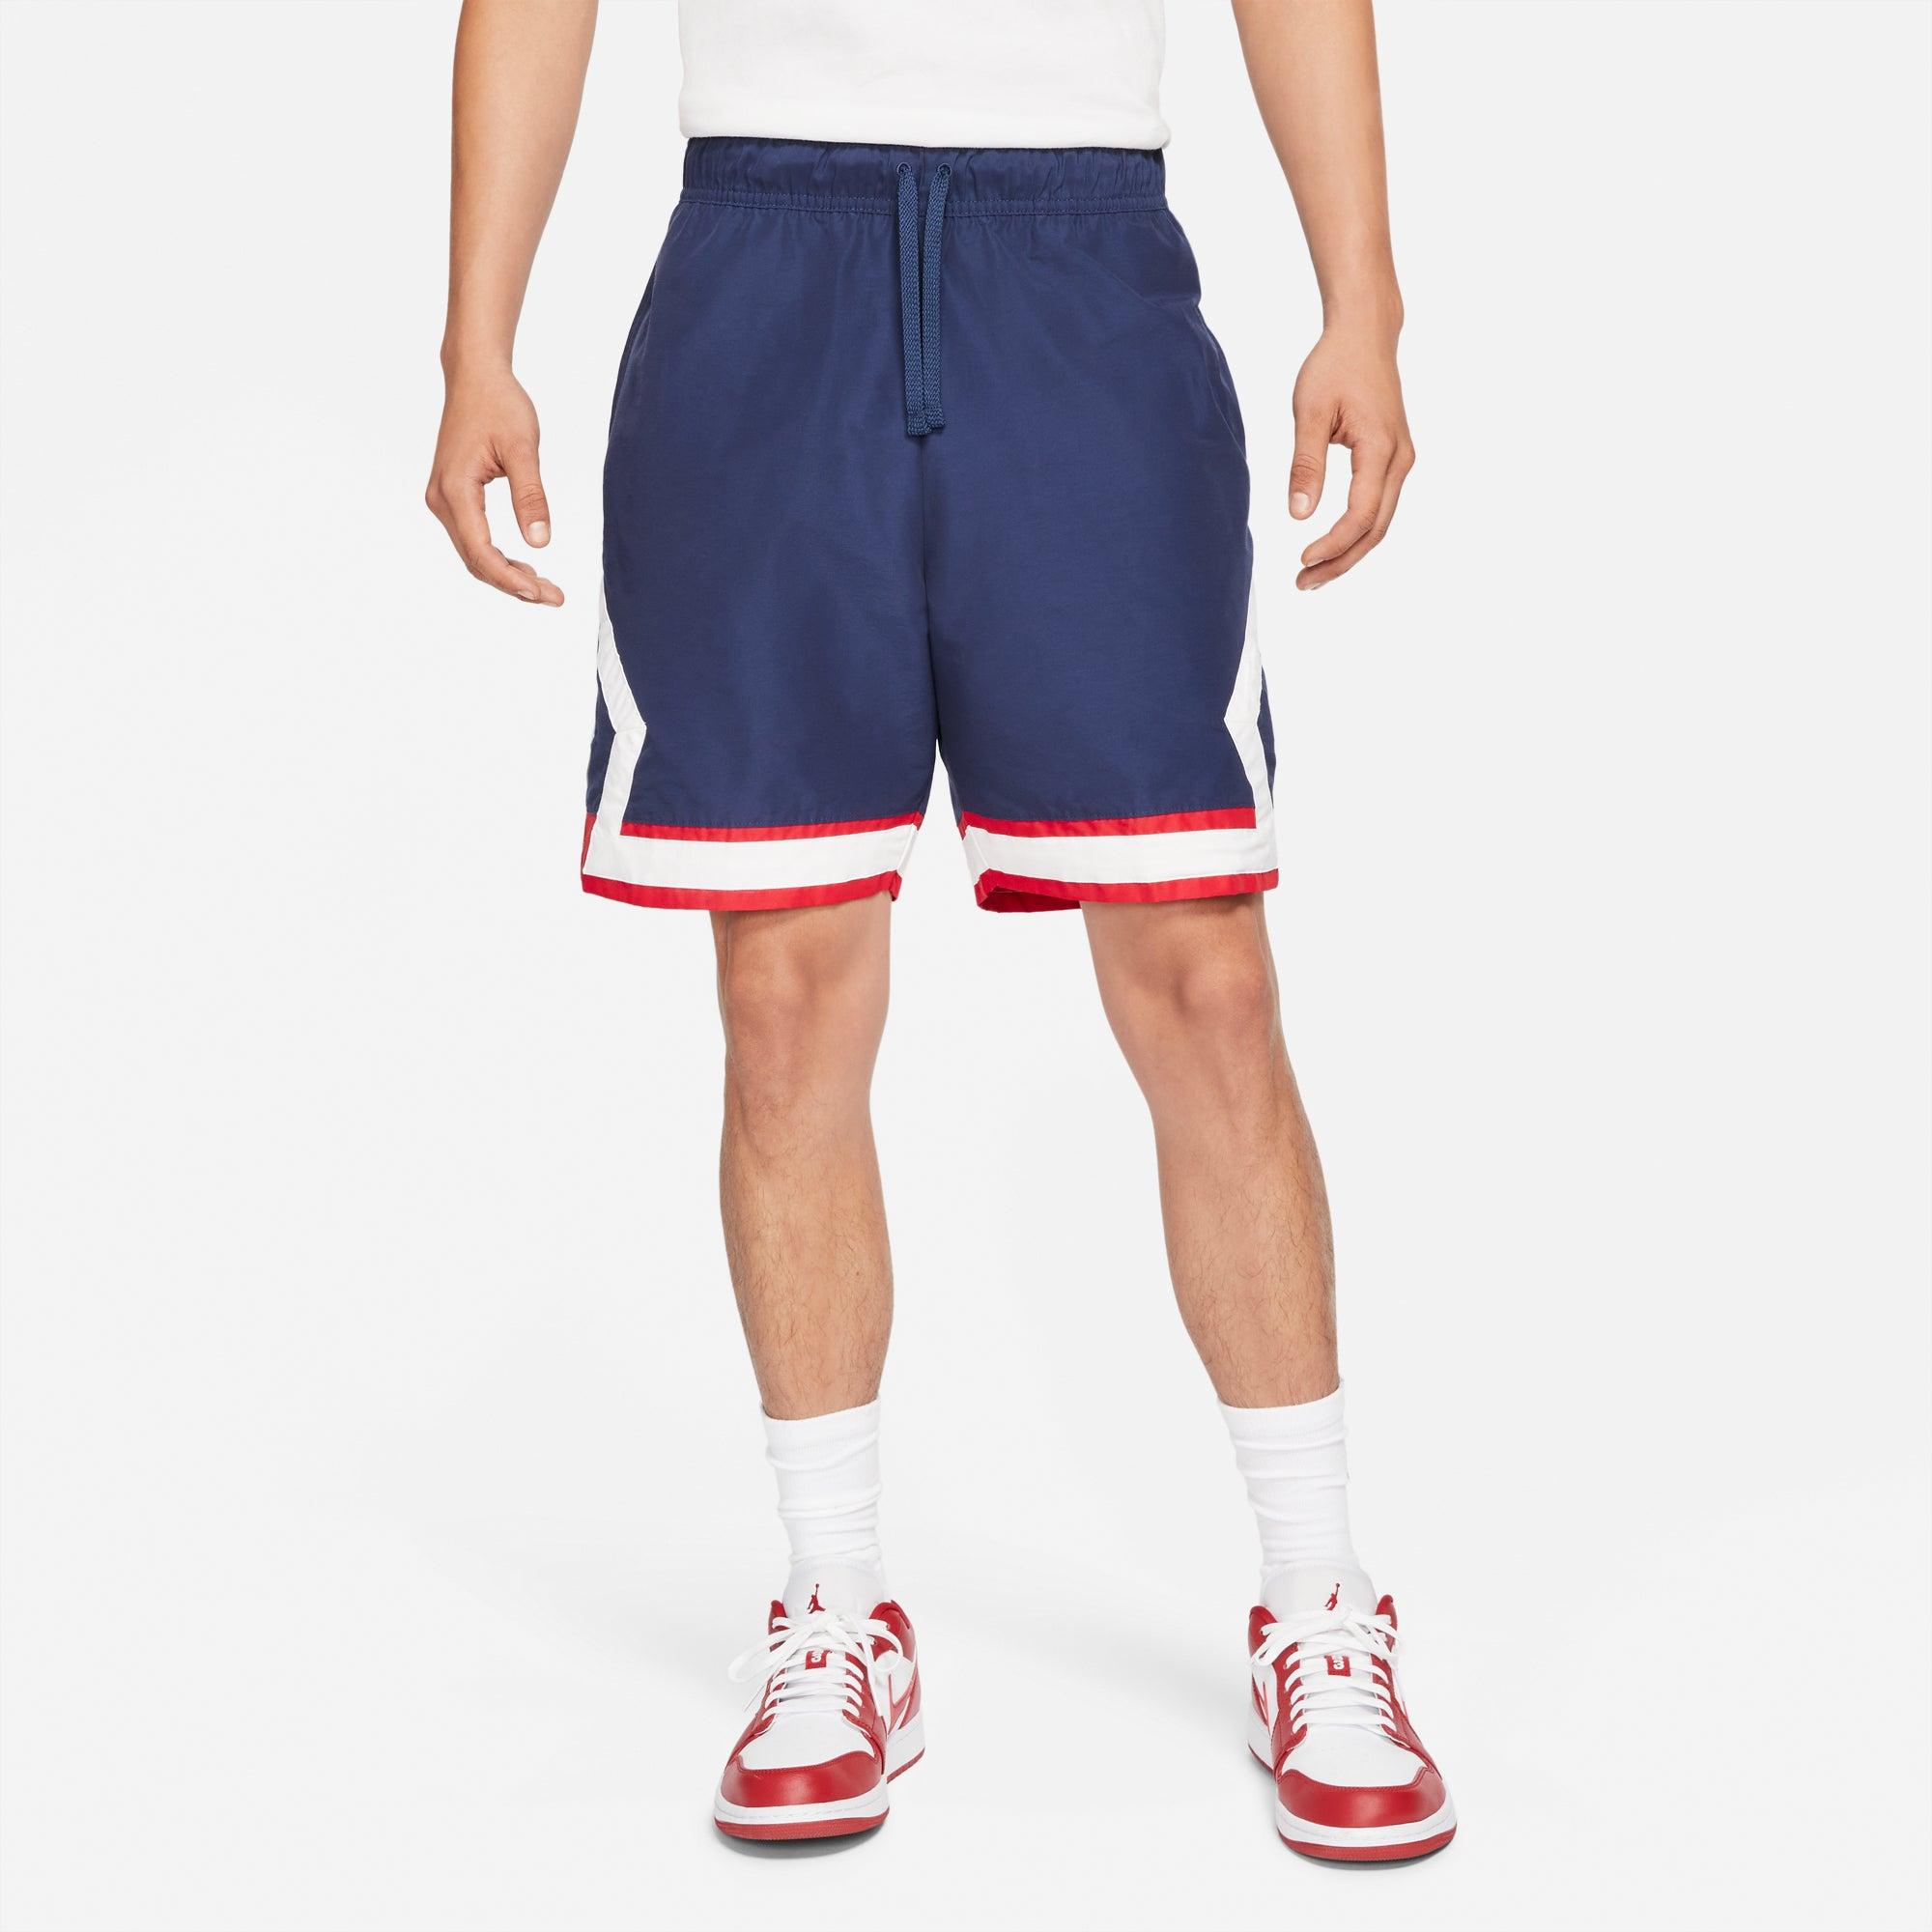 Jordan PSG Shorts